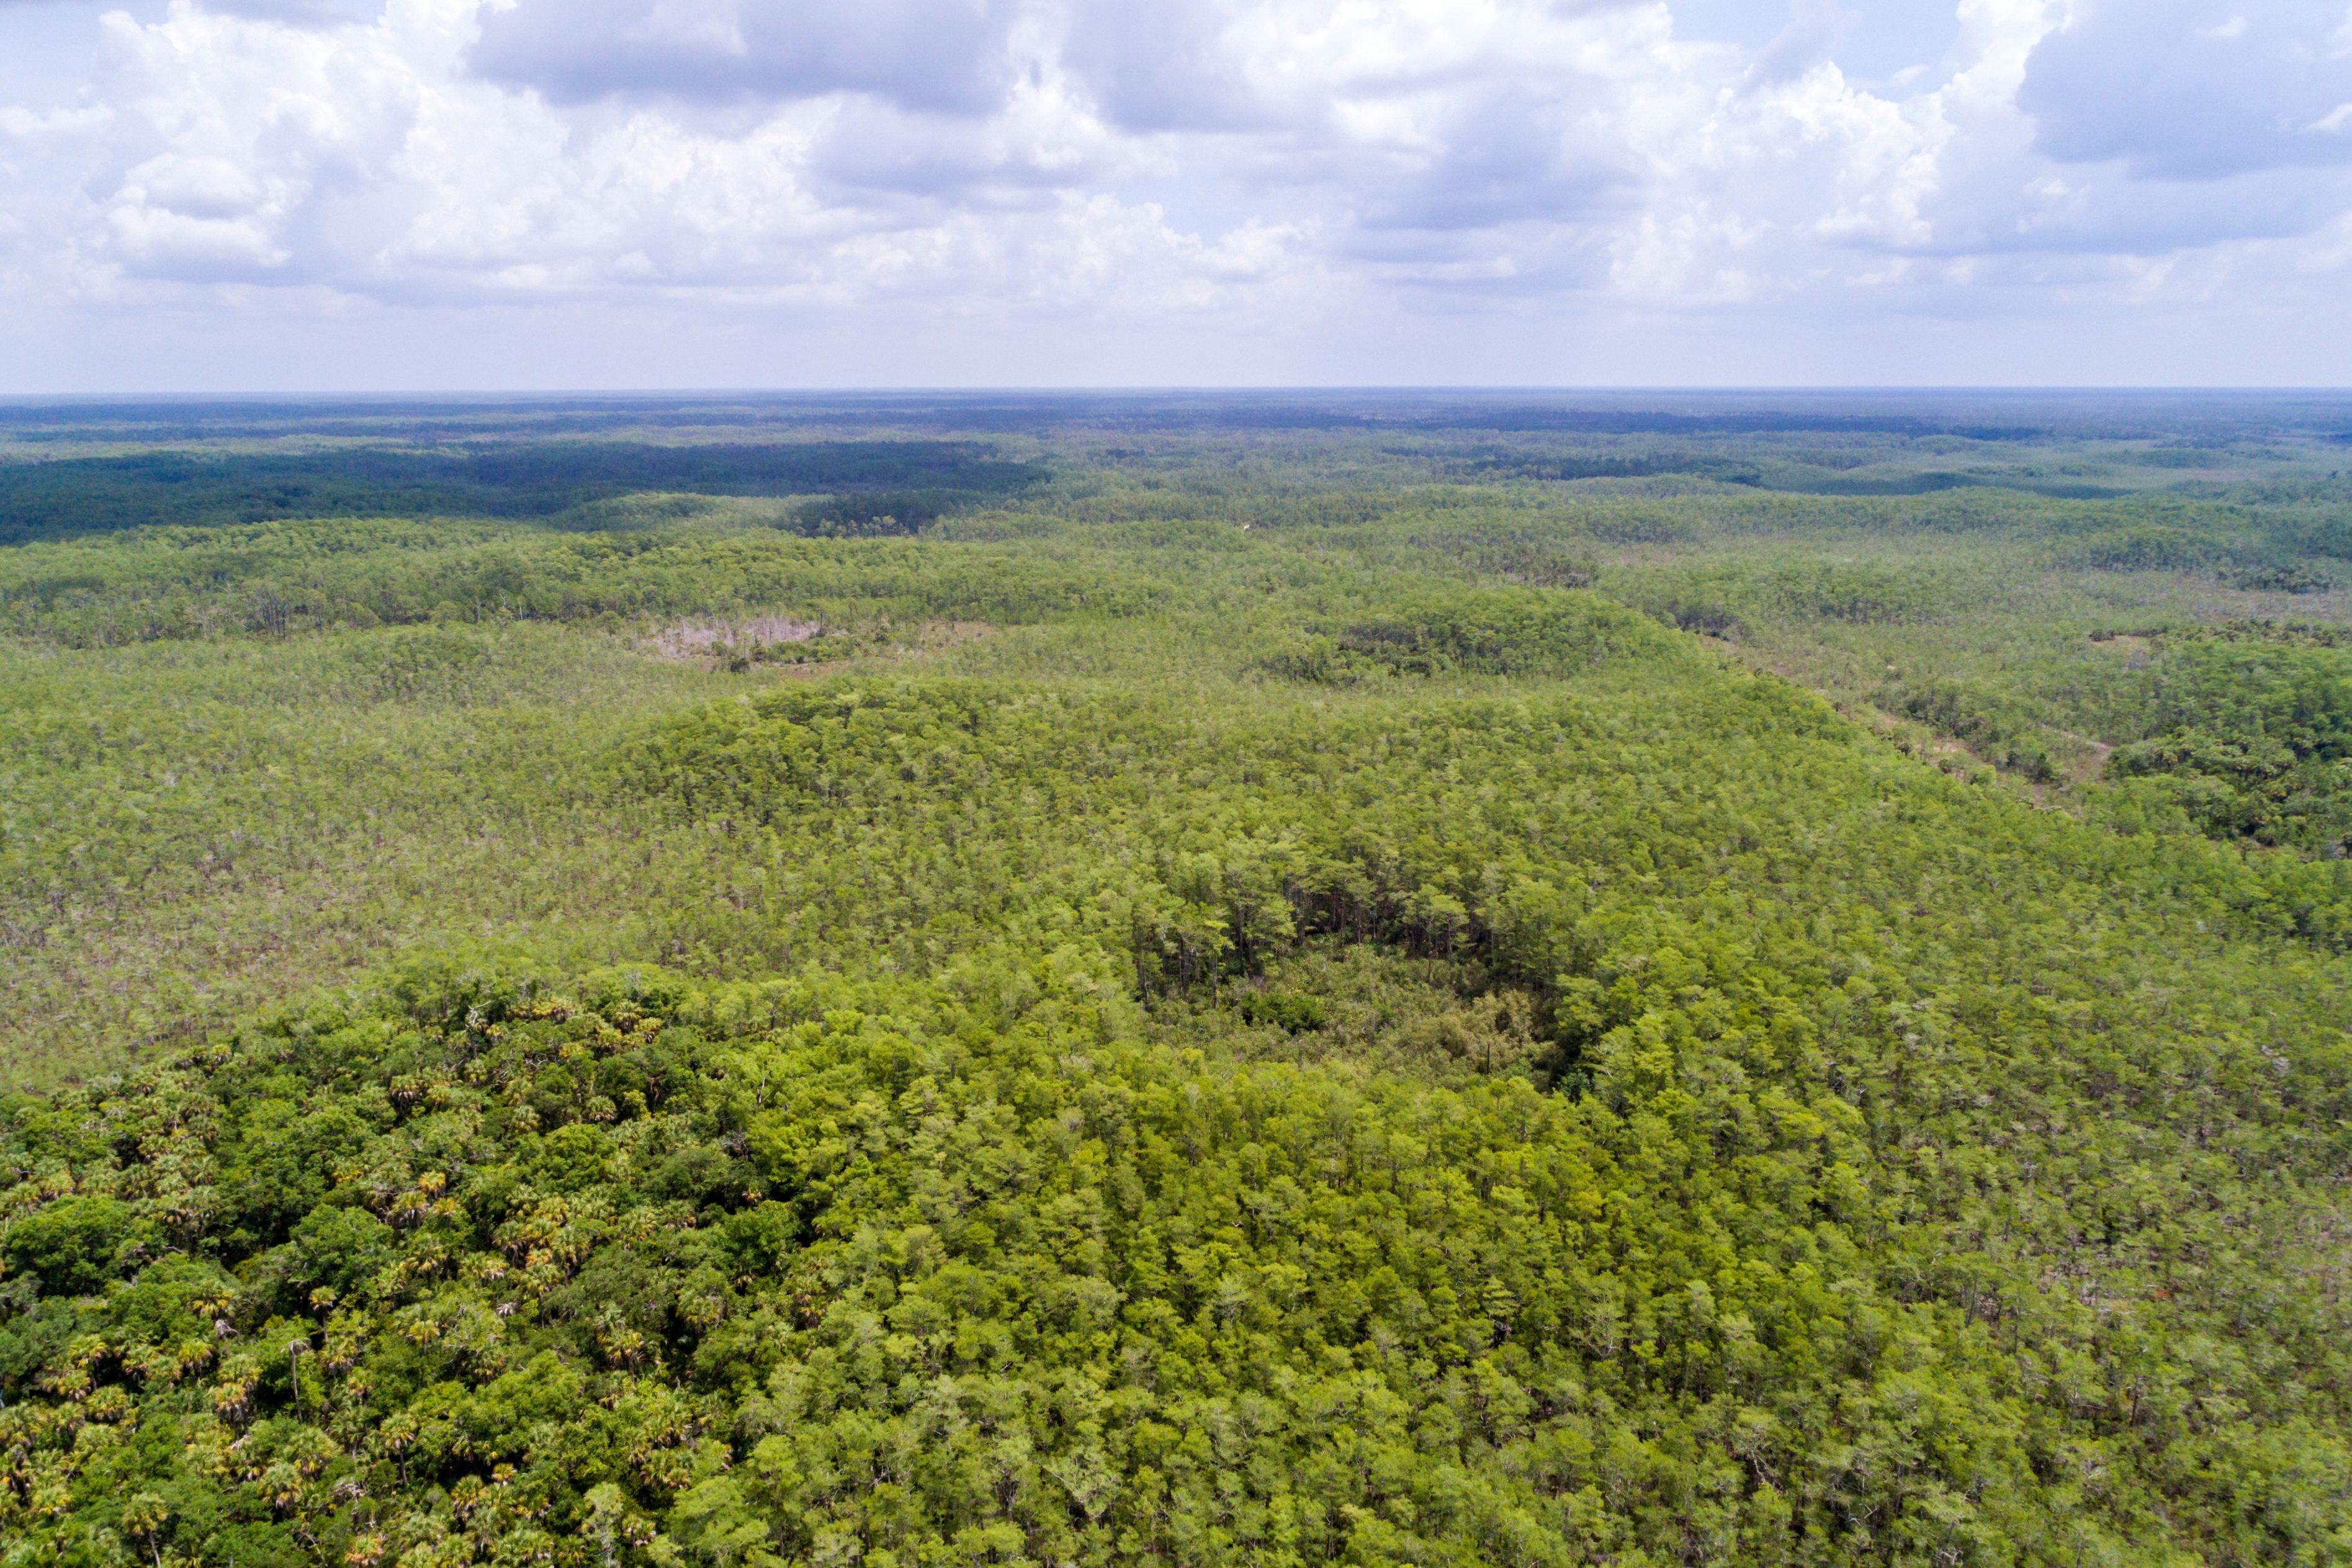 Florida, Naples, Everglades, Big Cypress National Preserve